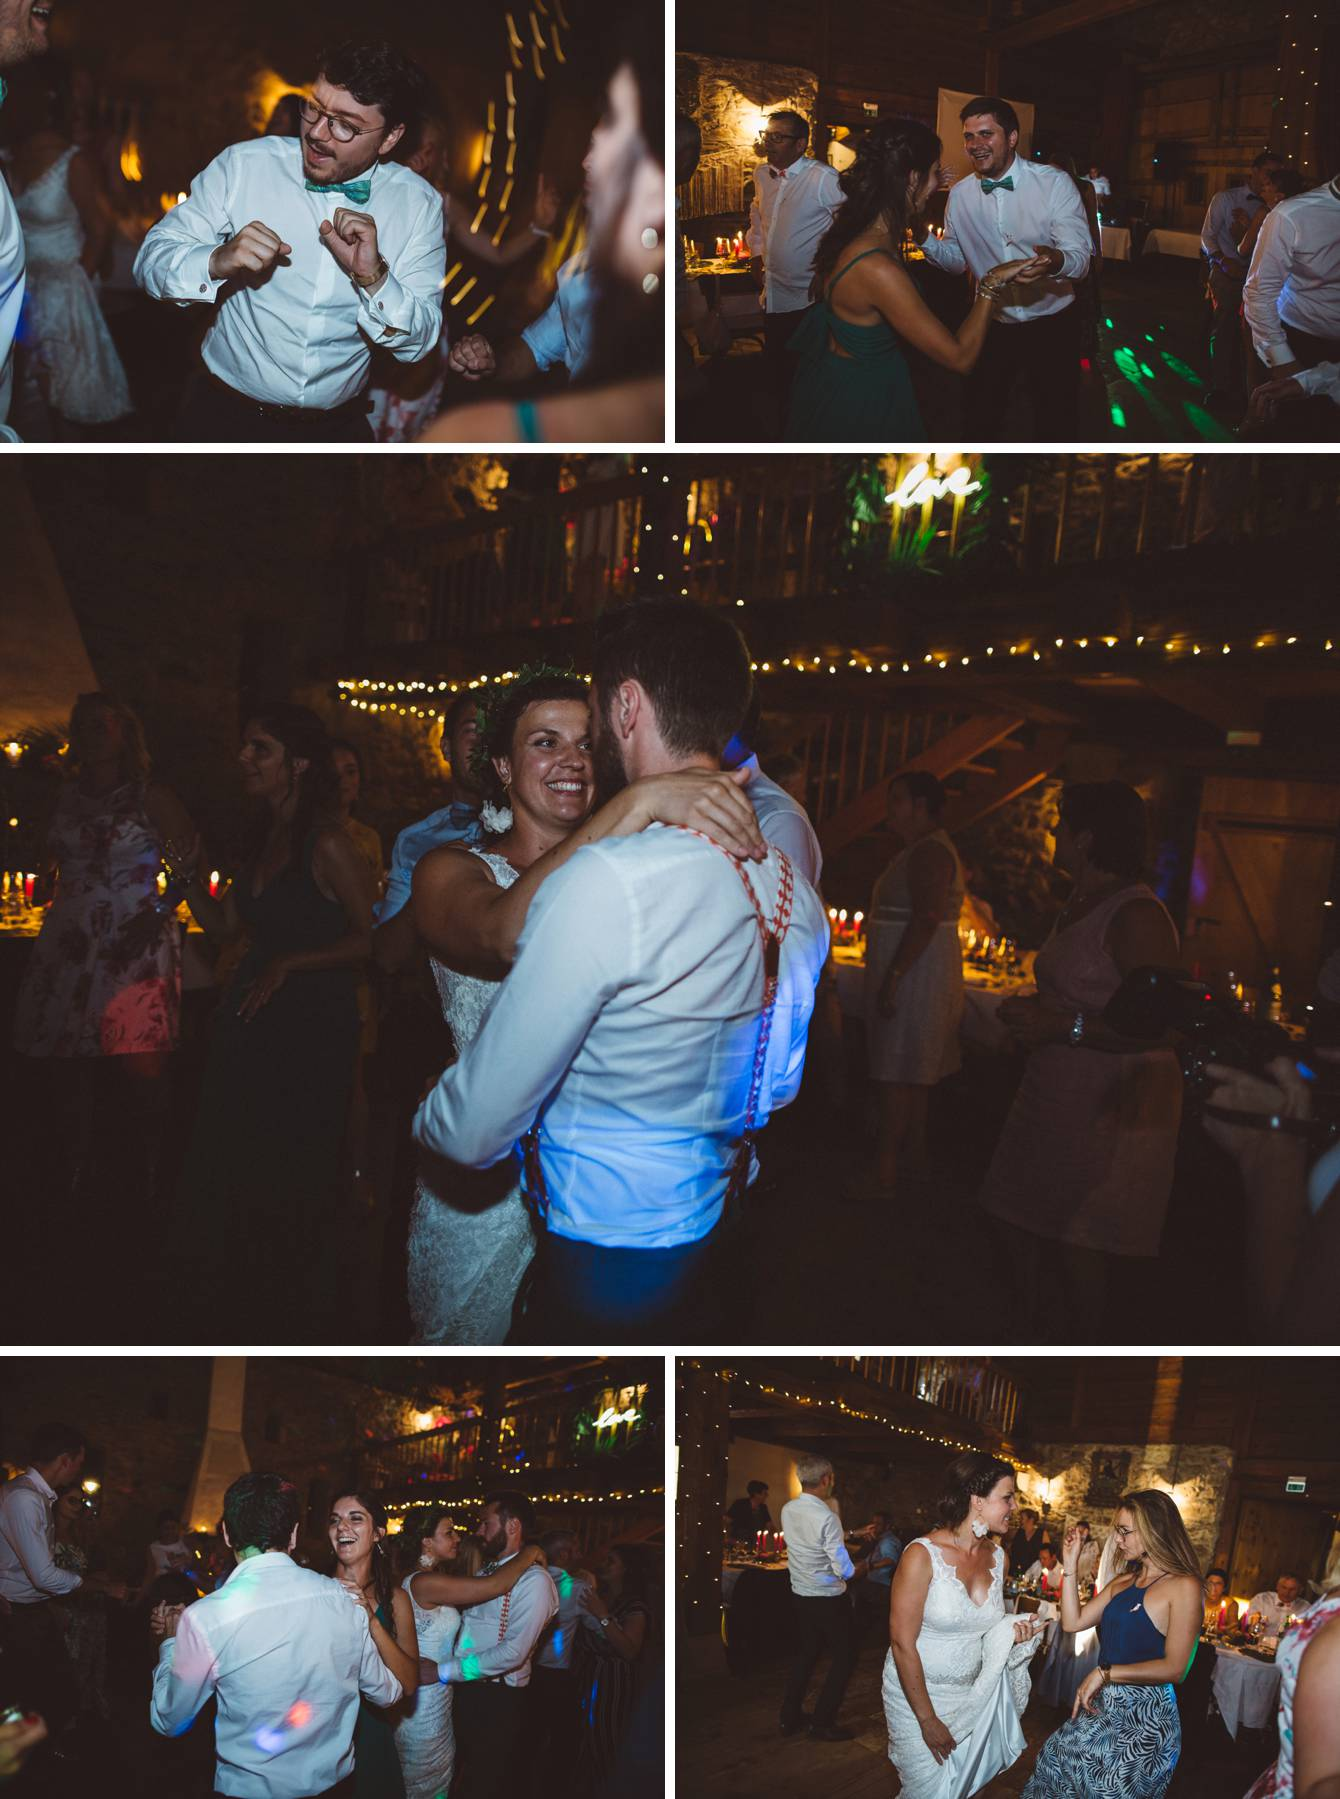 mariage-tropical-raben-horben_0033.jpg